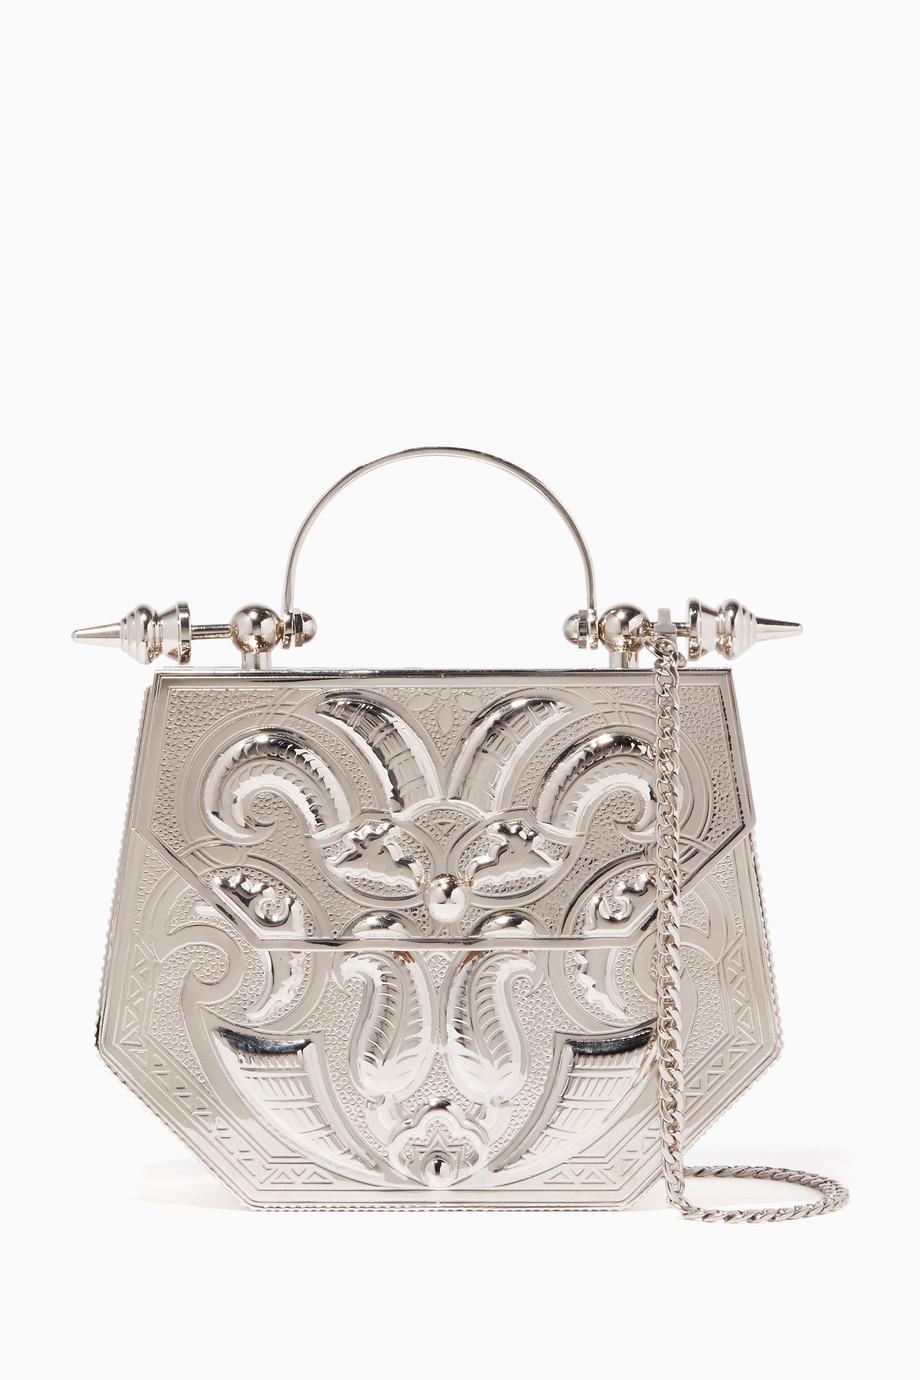 d550e7a6800ae تسوق حقيبة بيد علوية وتصميم محفور فضية اختين فضي للنساء